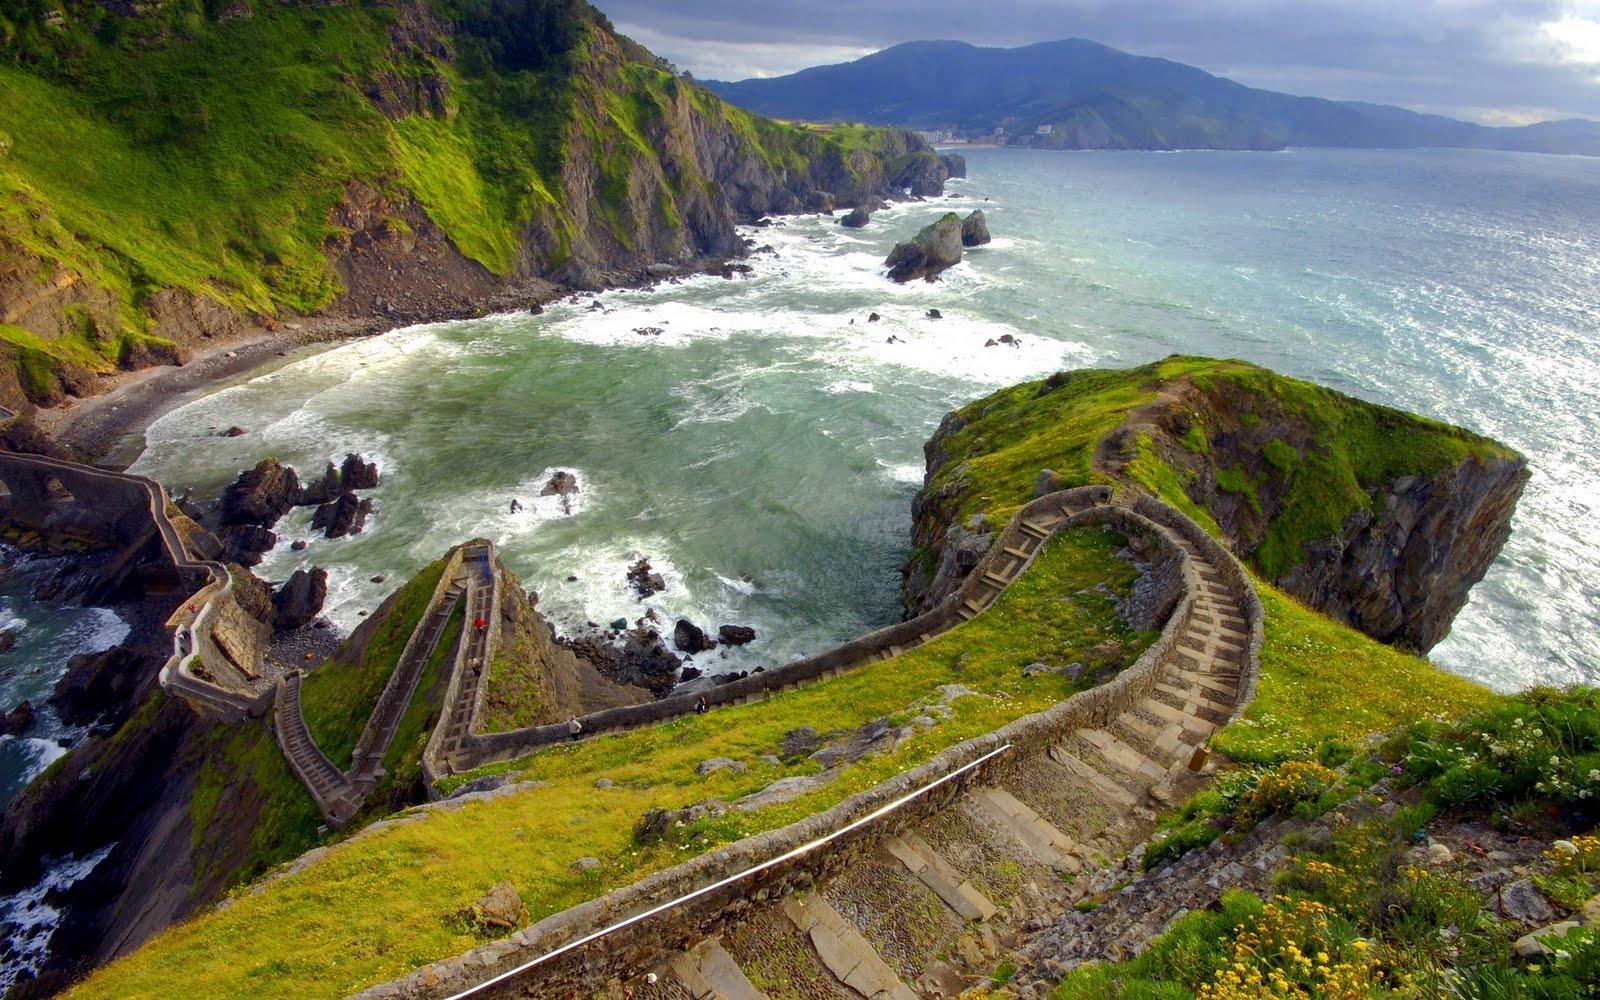 Escalera a las montañas - Hill stairs